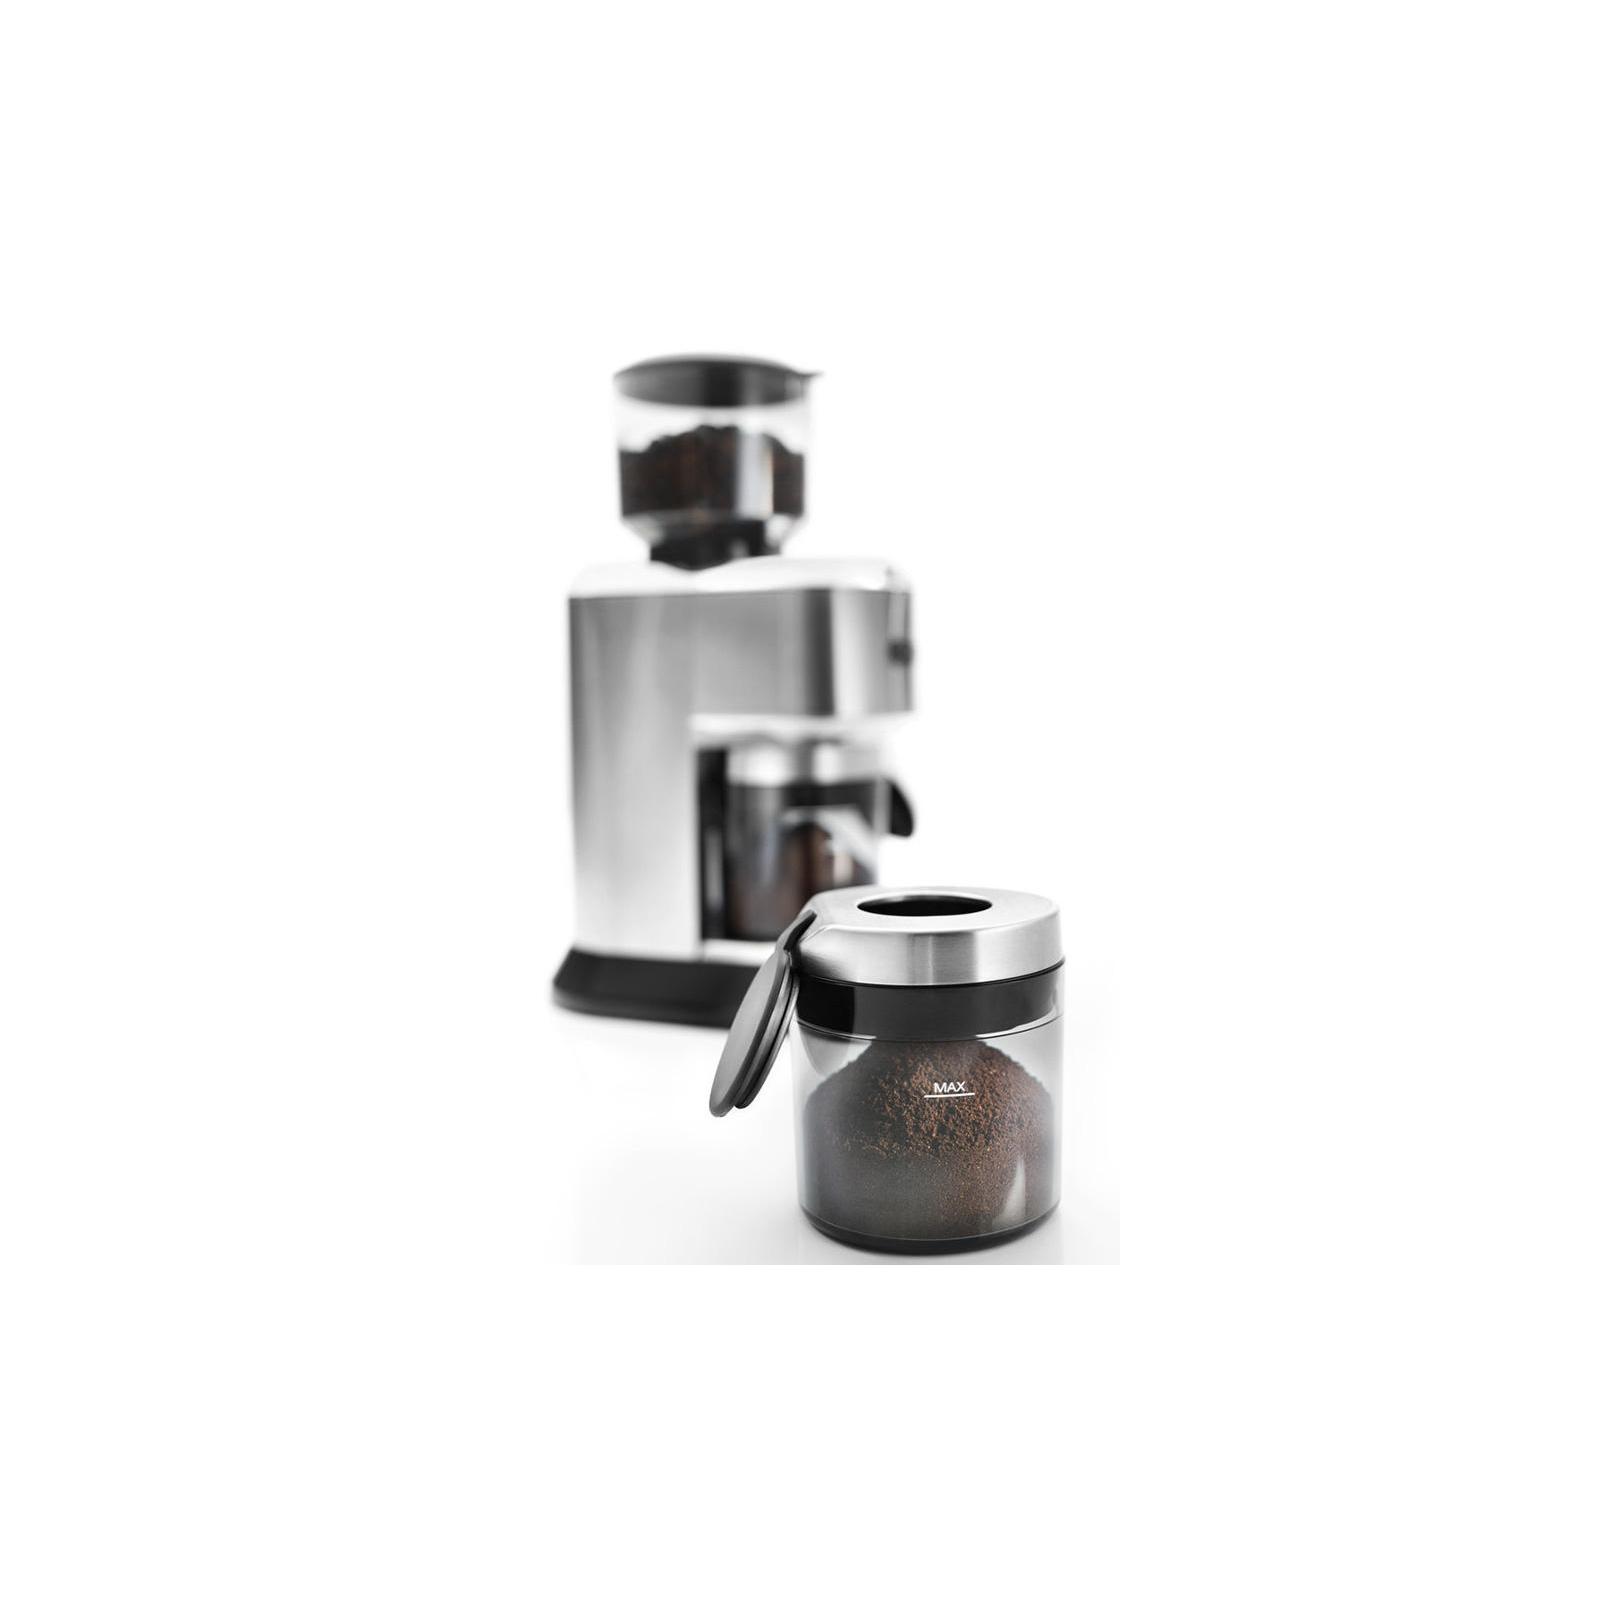 Кофемолка DeLonghi KG 520 M изображение 2